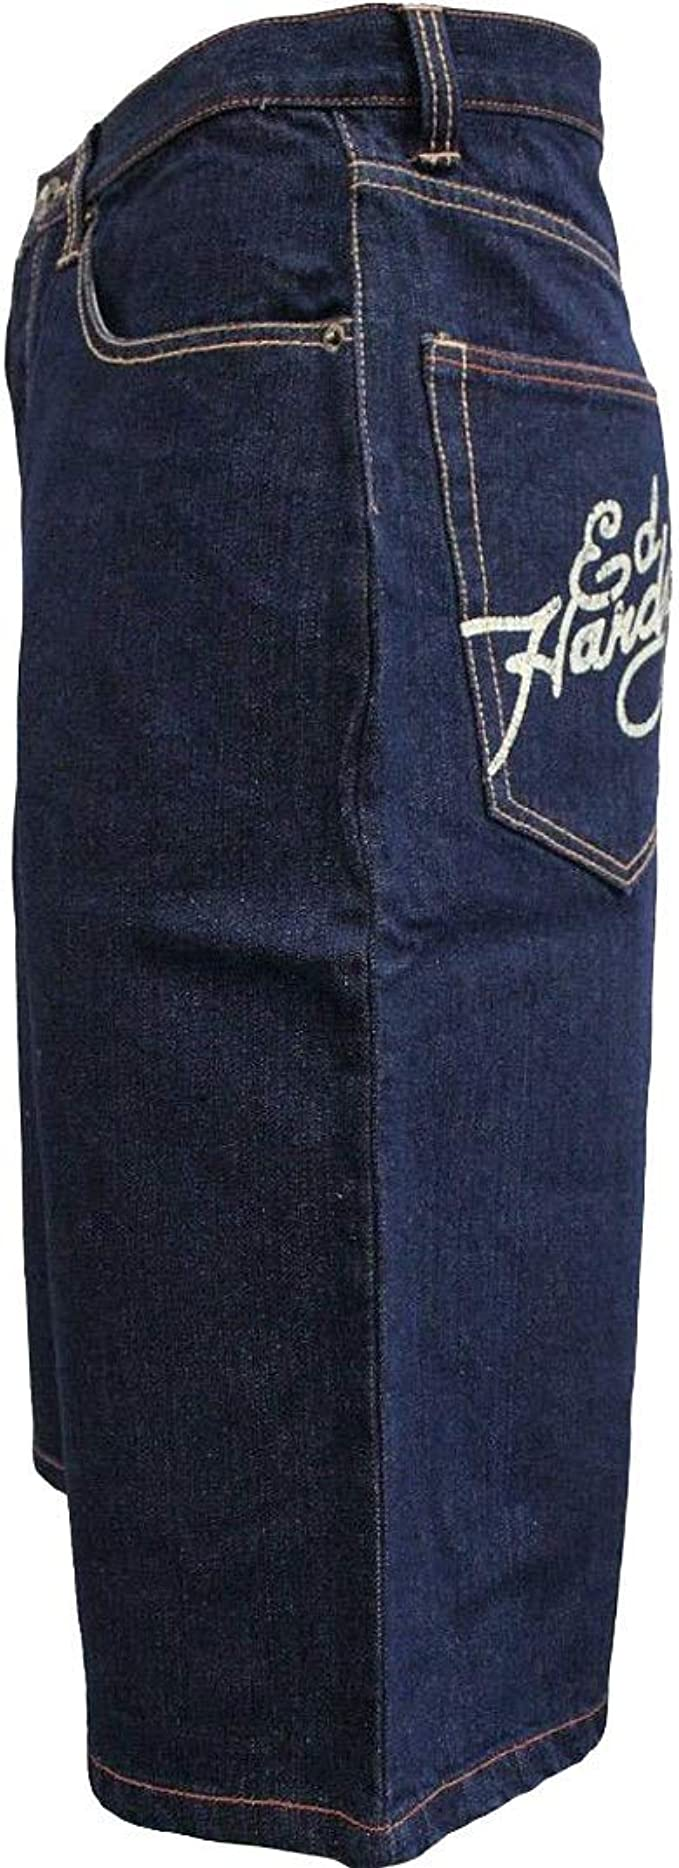 Amazon Com Ed Hardy By Christian Audigier Pantalones Vaqueros Para Hombre Alive Aware 38 Clothing